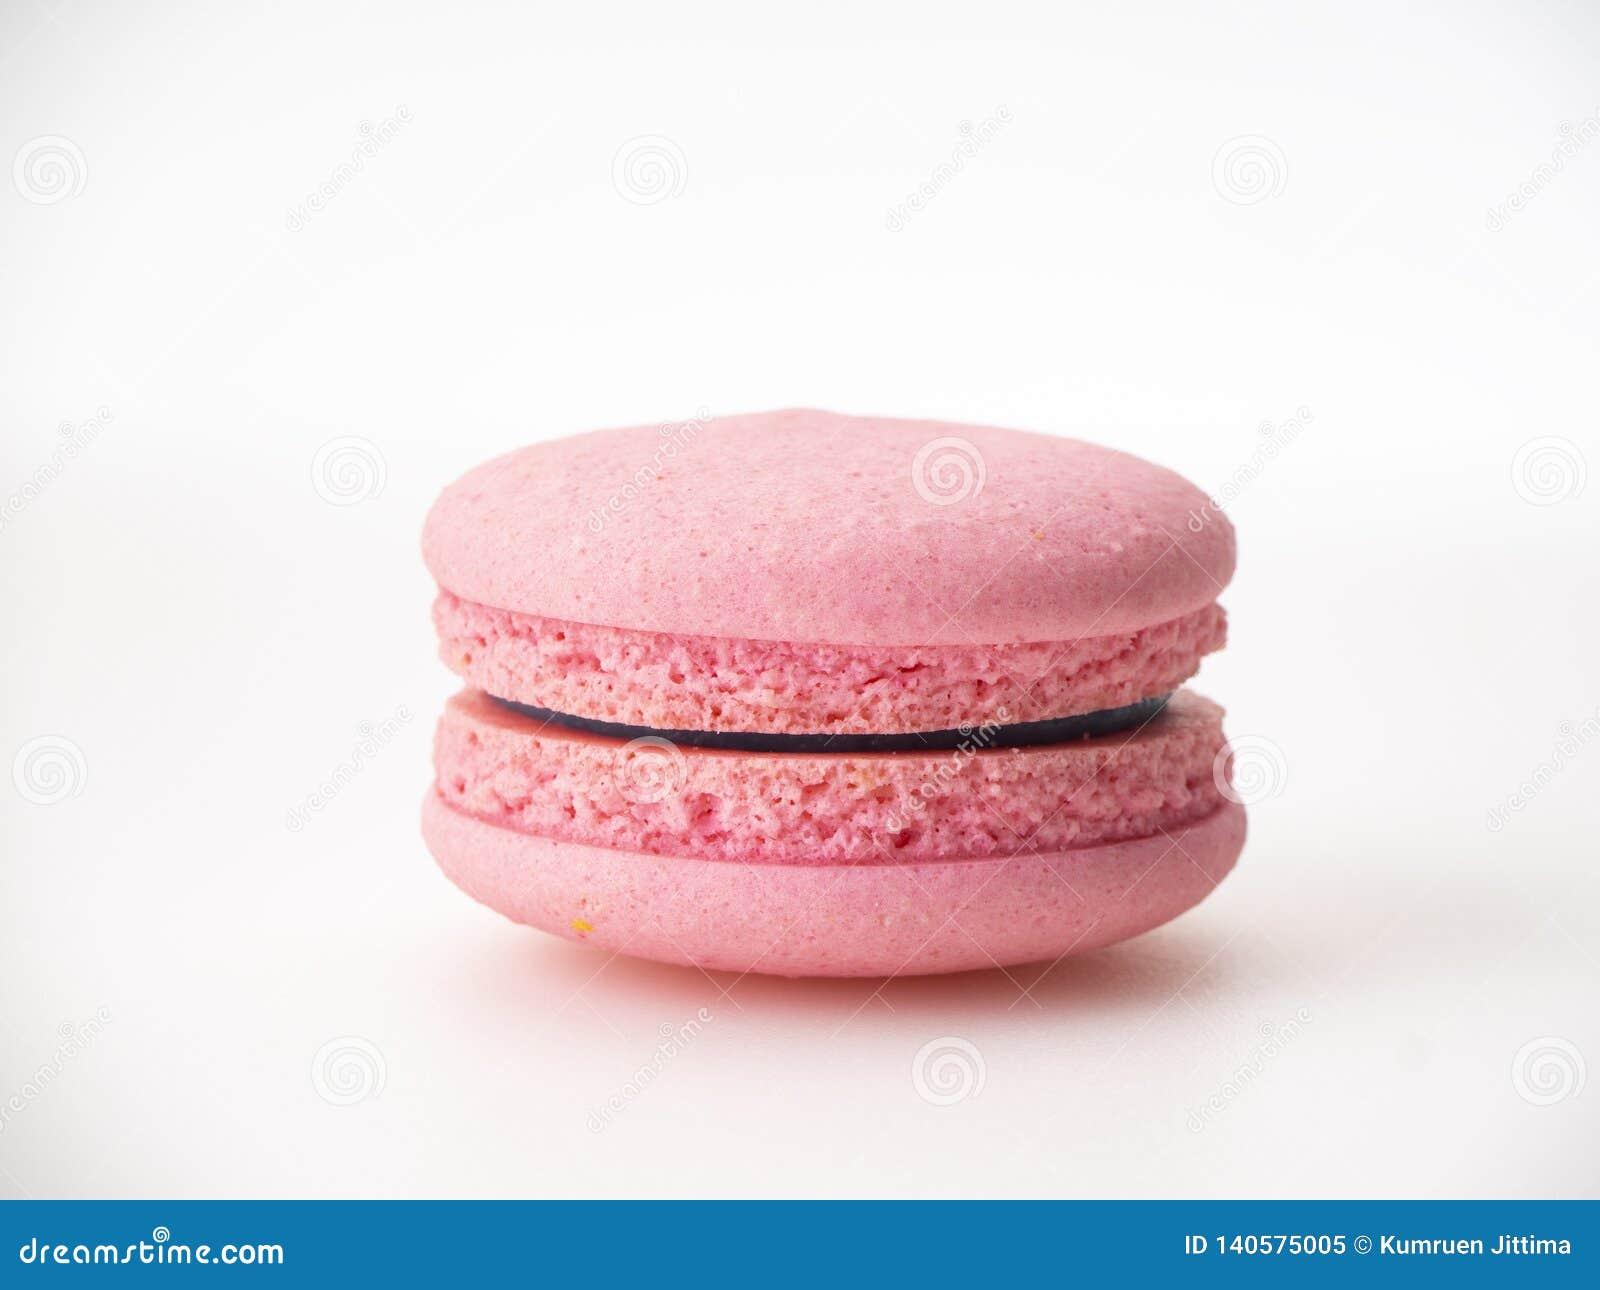 Maccherone rosa su fondo bianco